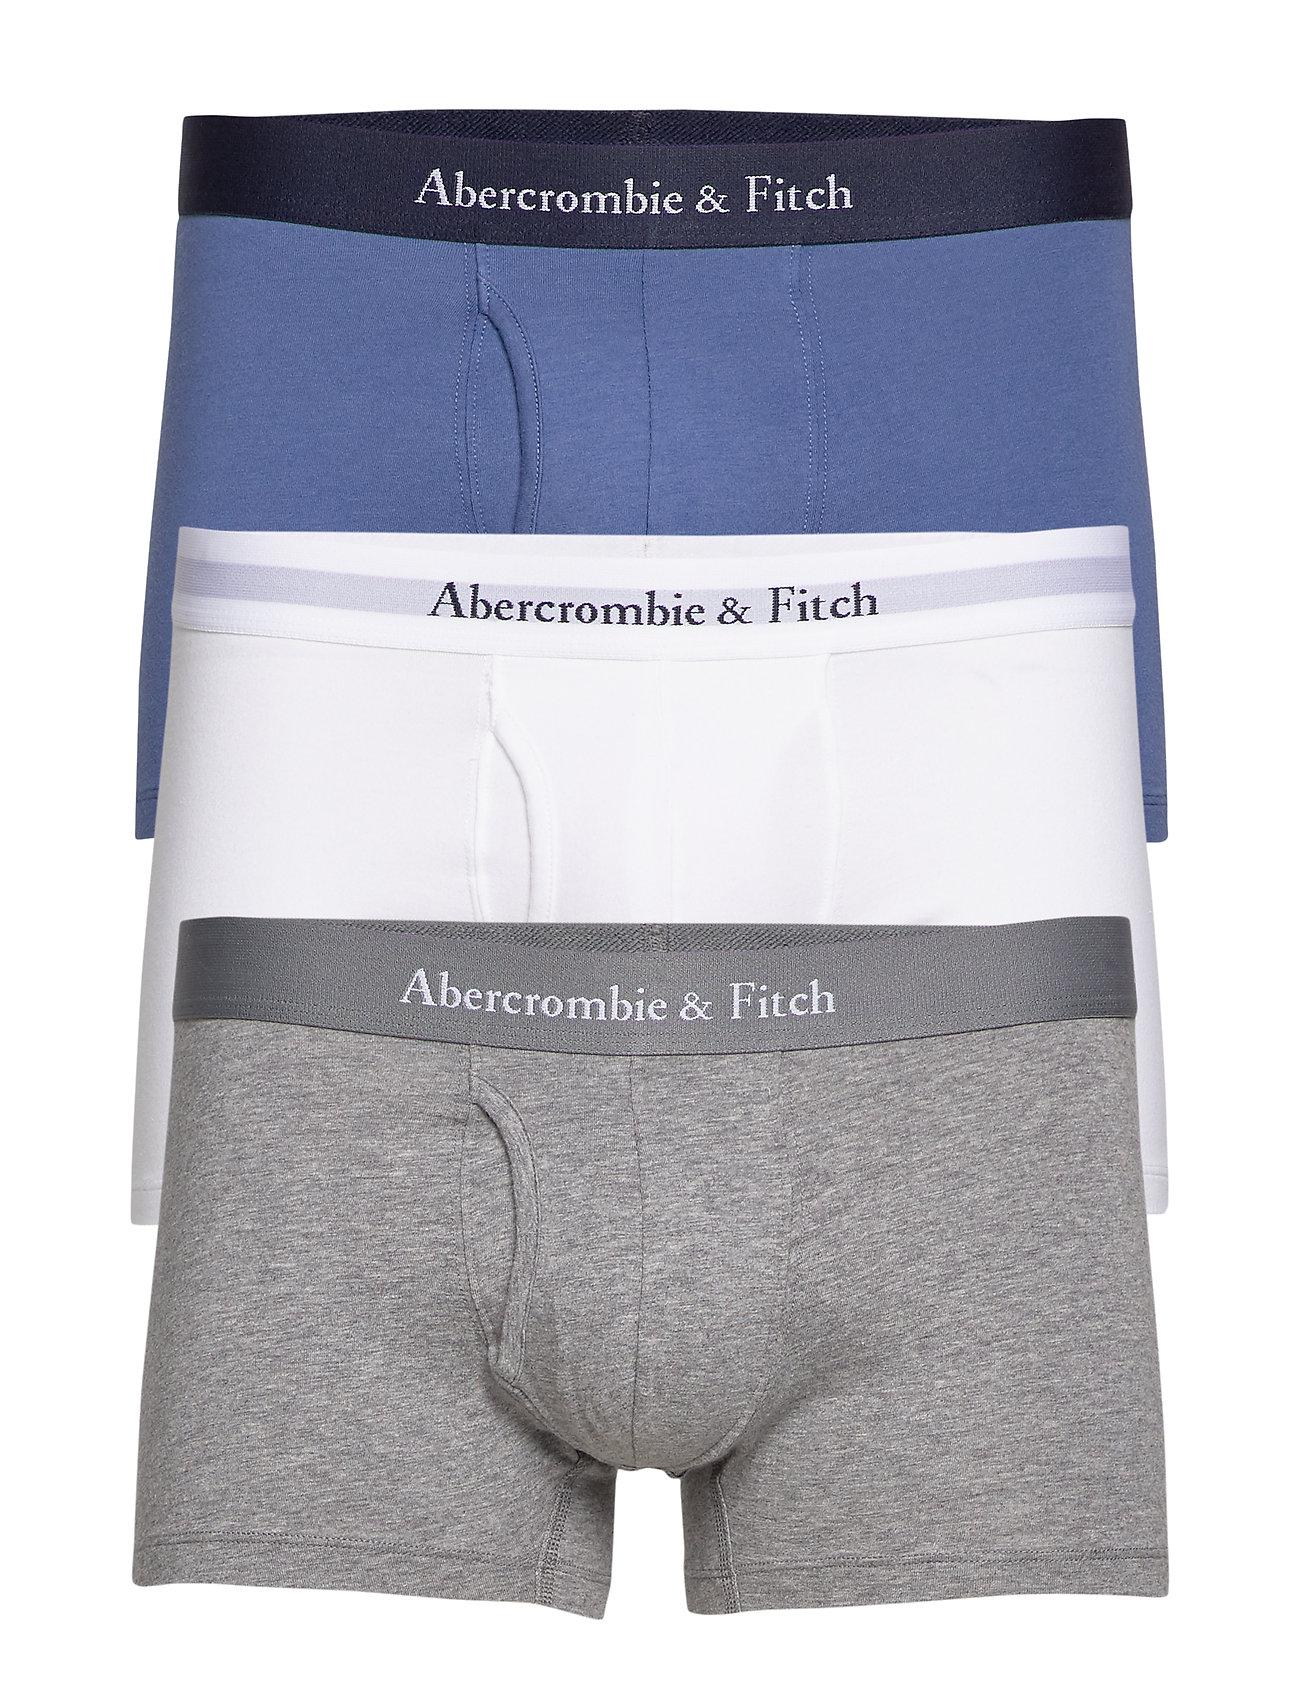 Abercrombie & Fitch Underwear - MED GREY FLAT